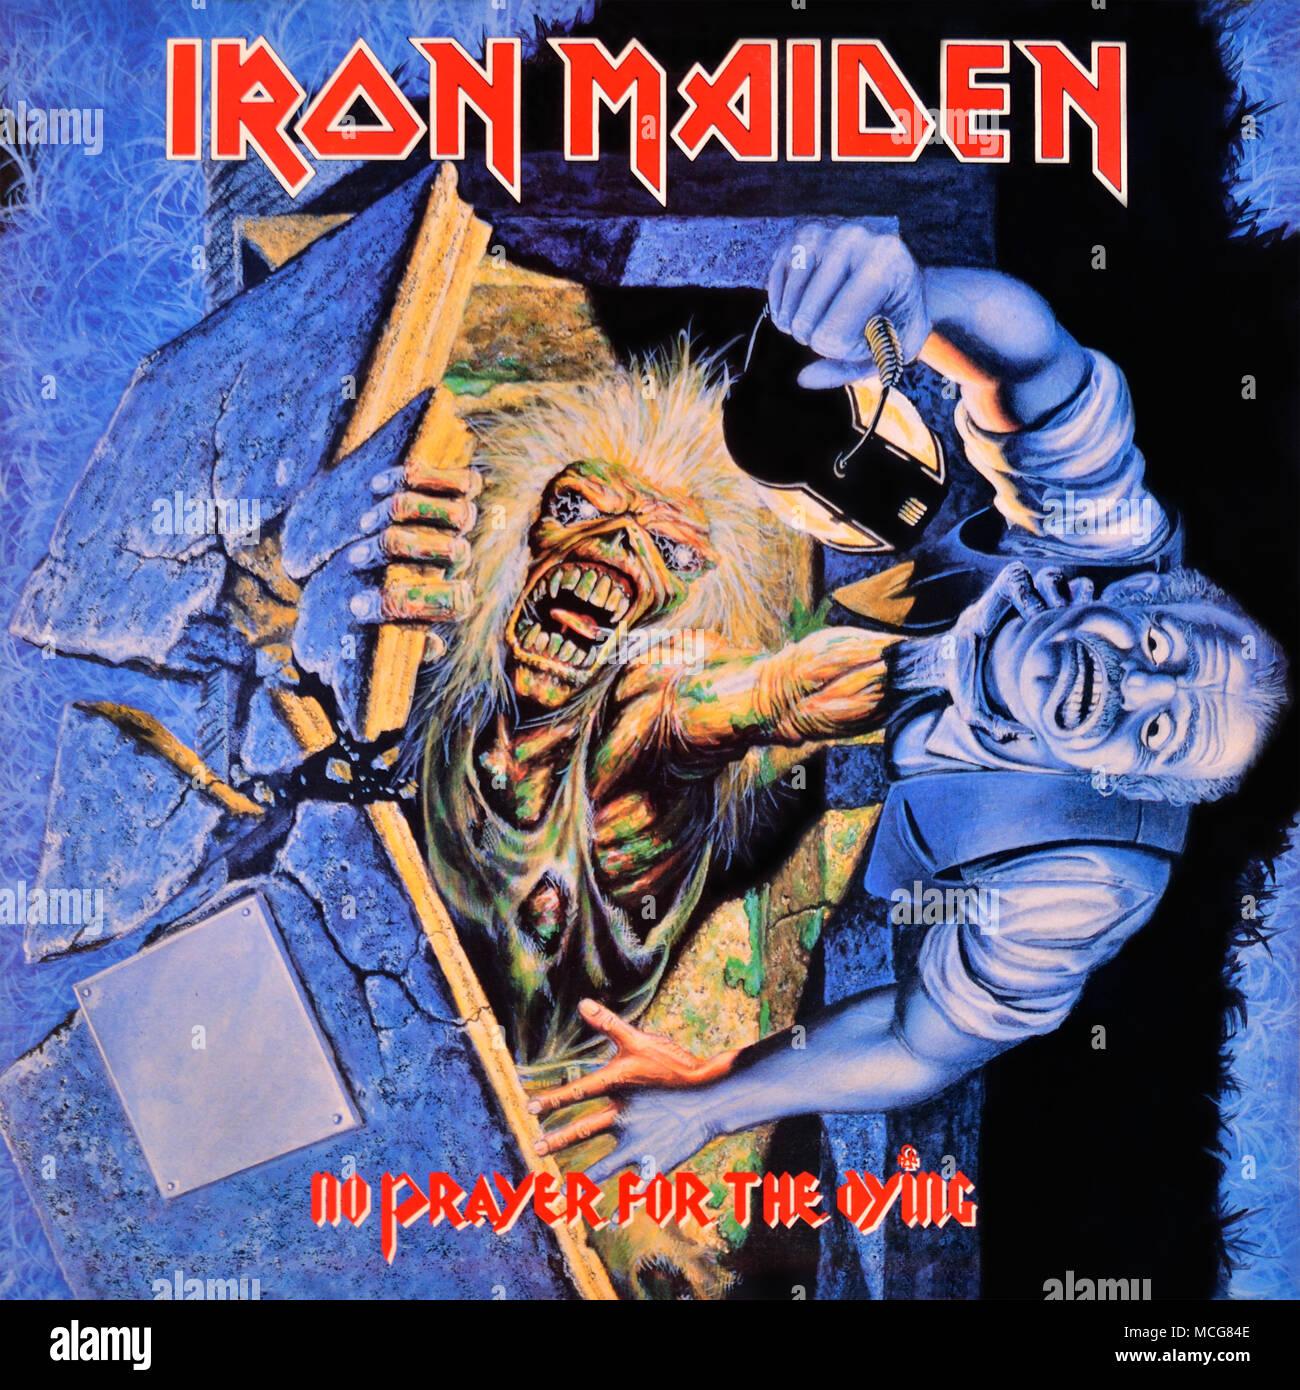 91189c9b1 Iron Maiden original vinyl album cover - No Prayer For The Dying - 1990 -  Stock